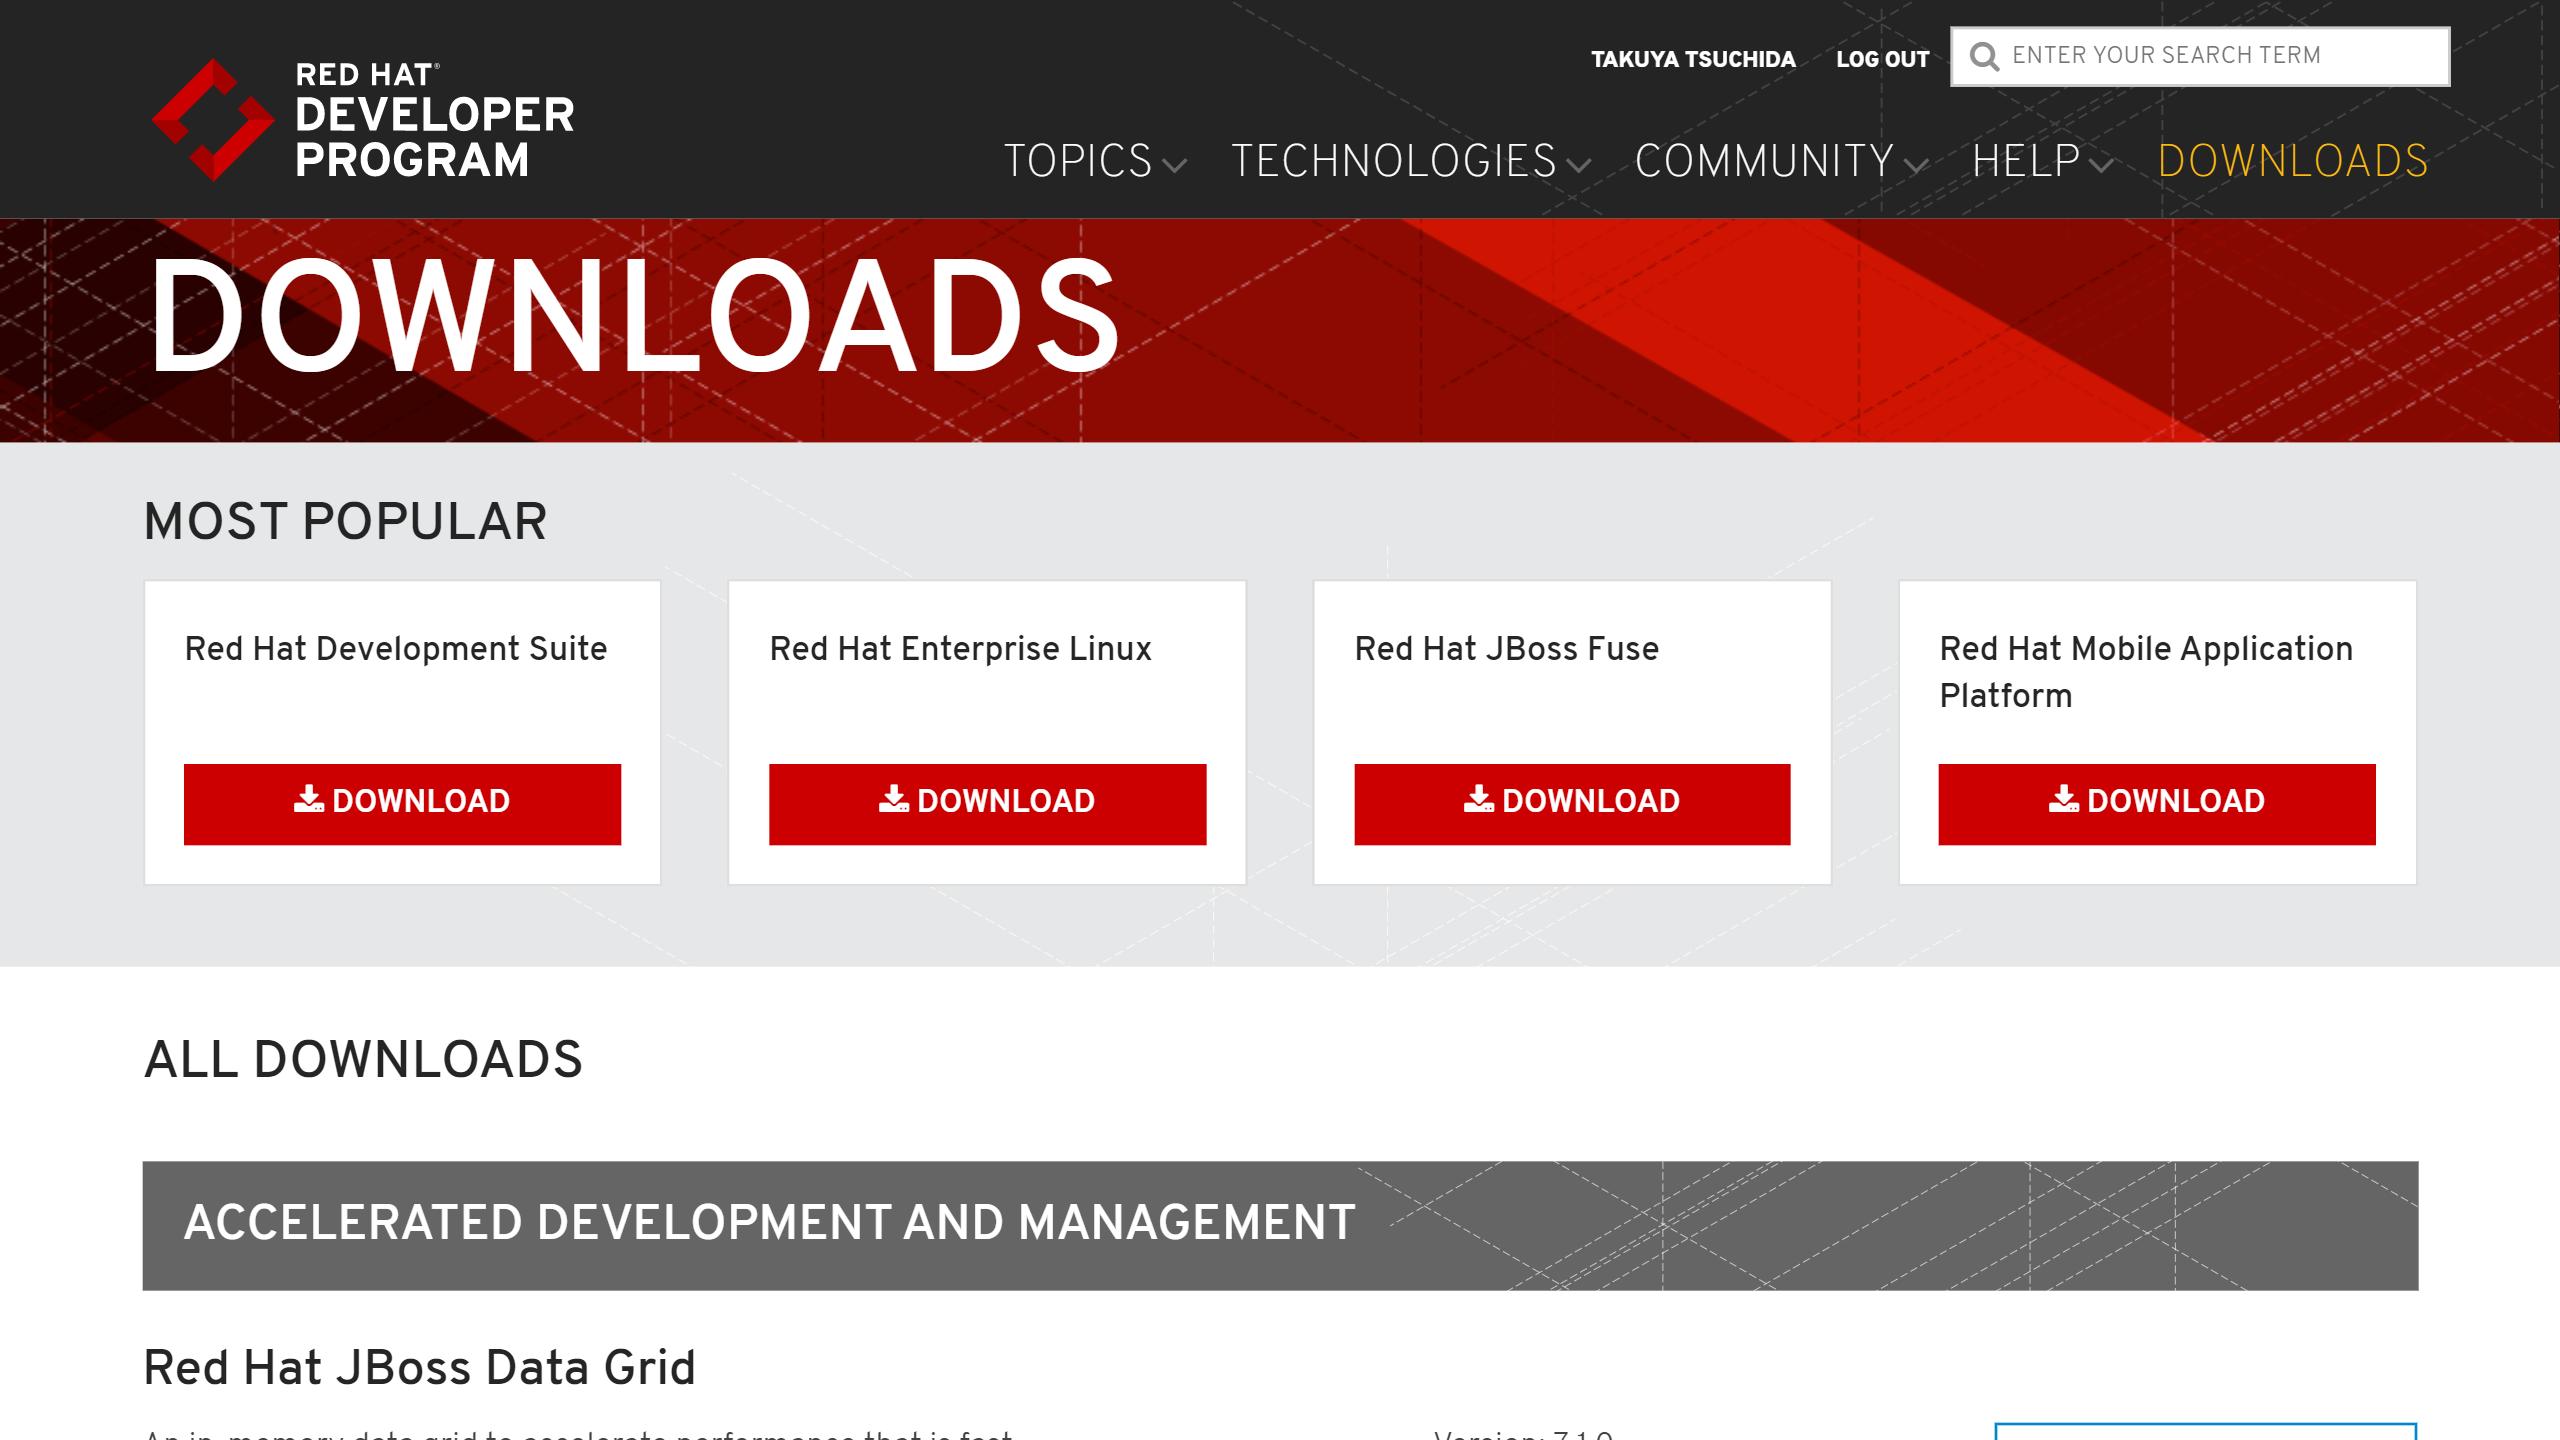 red-hat-developer-program-downloads